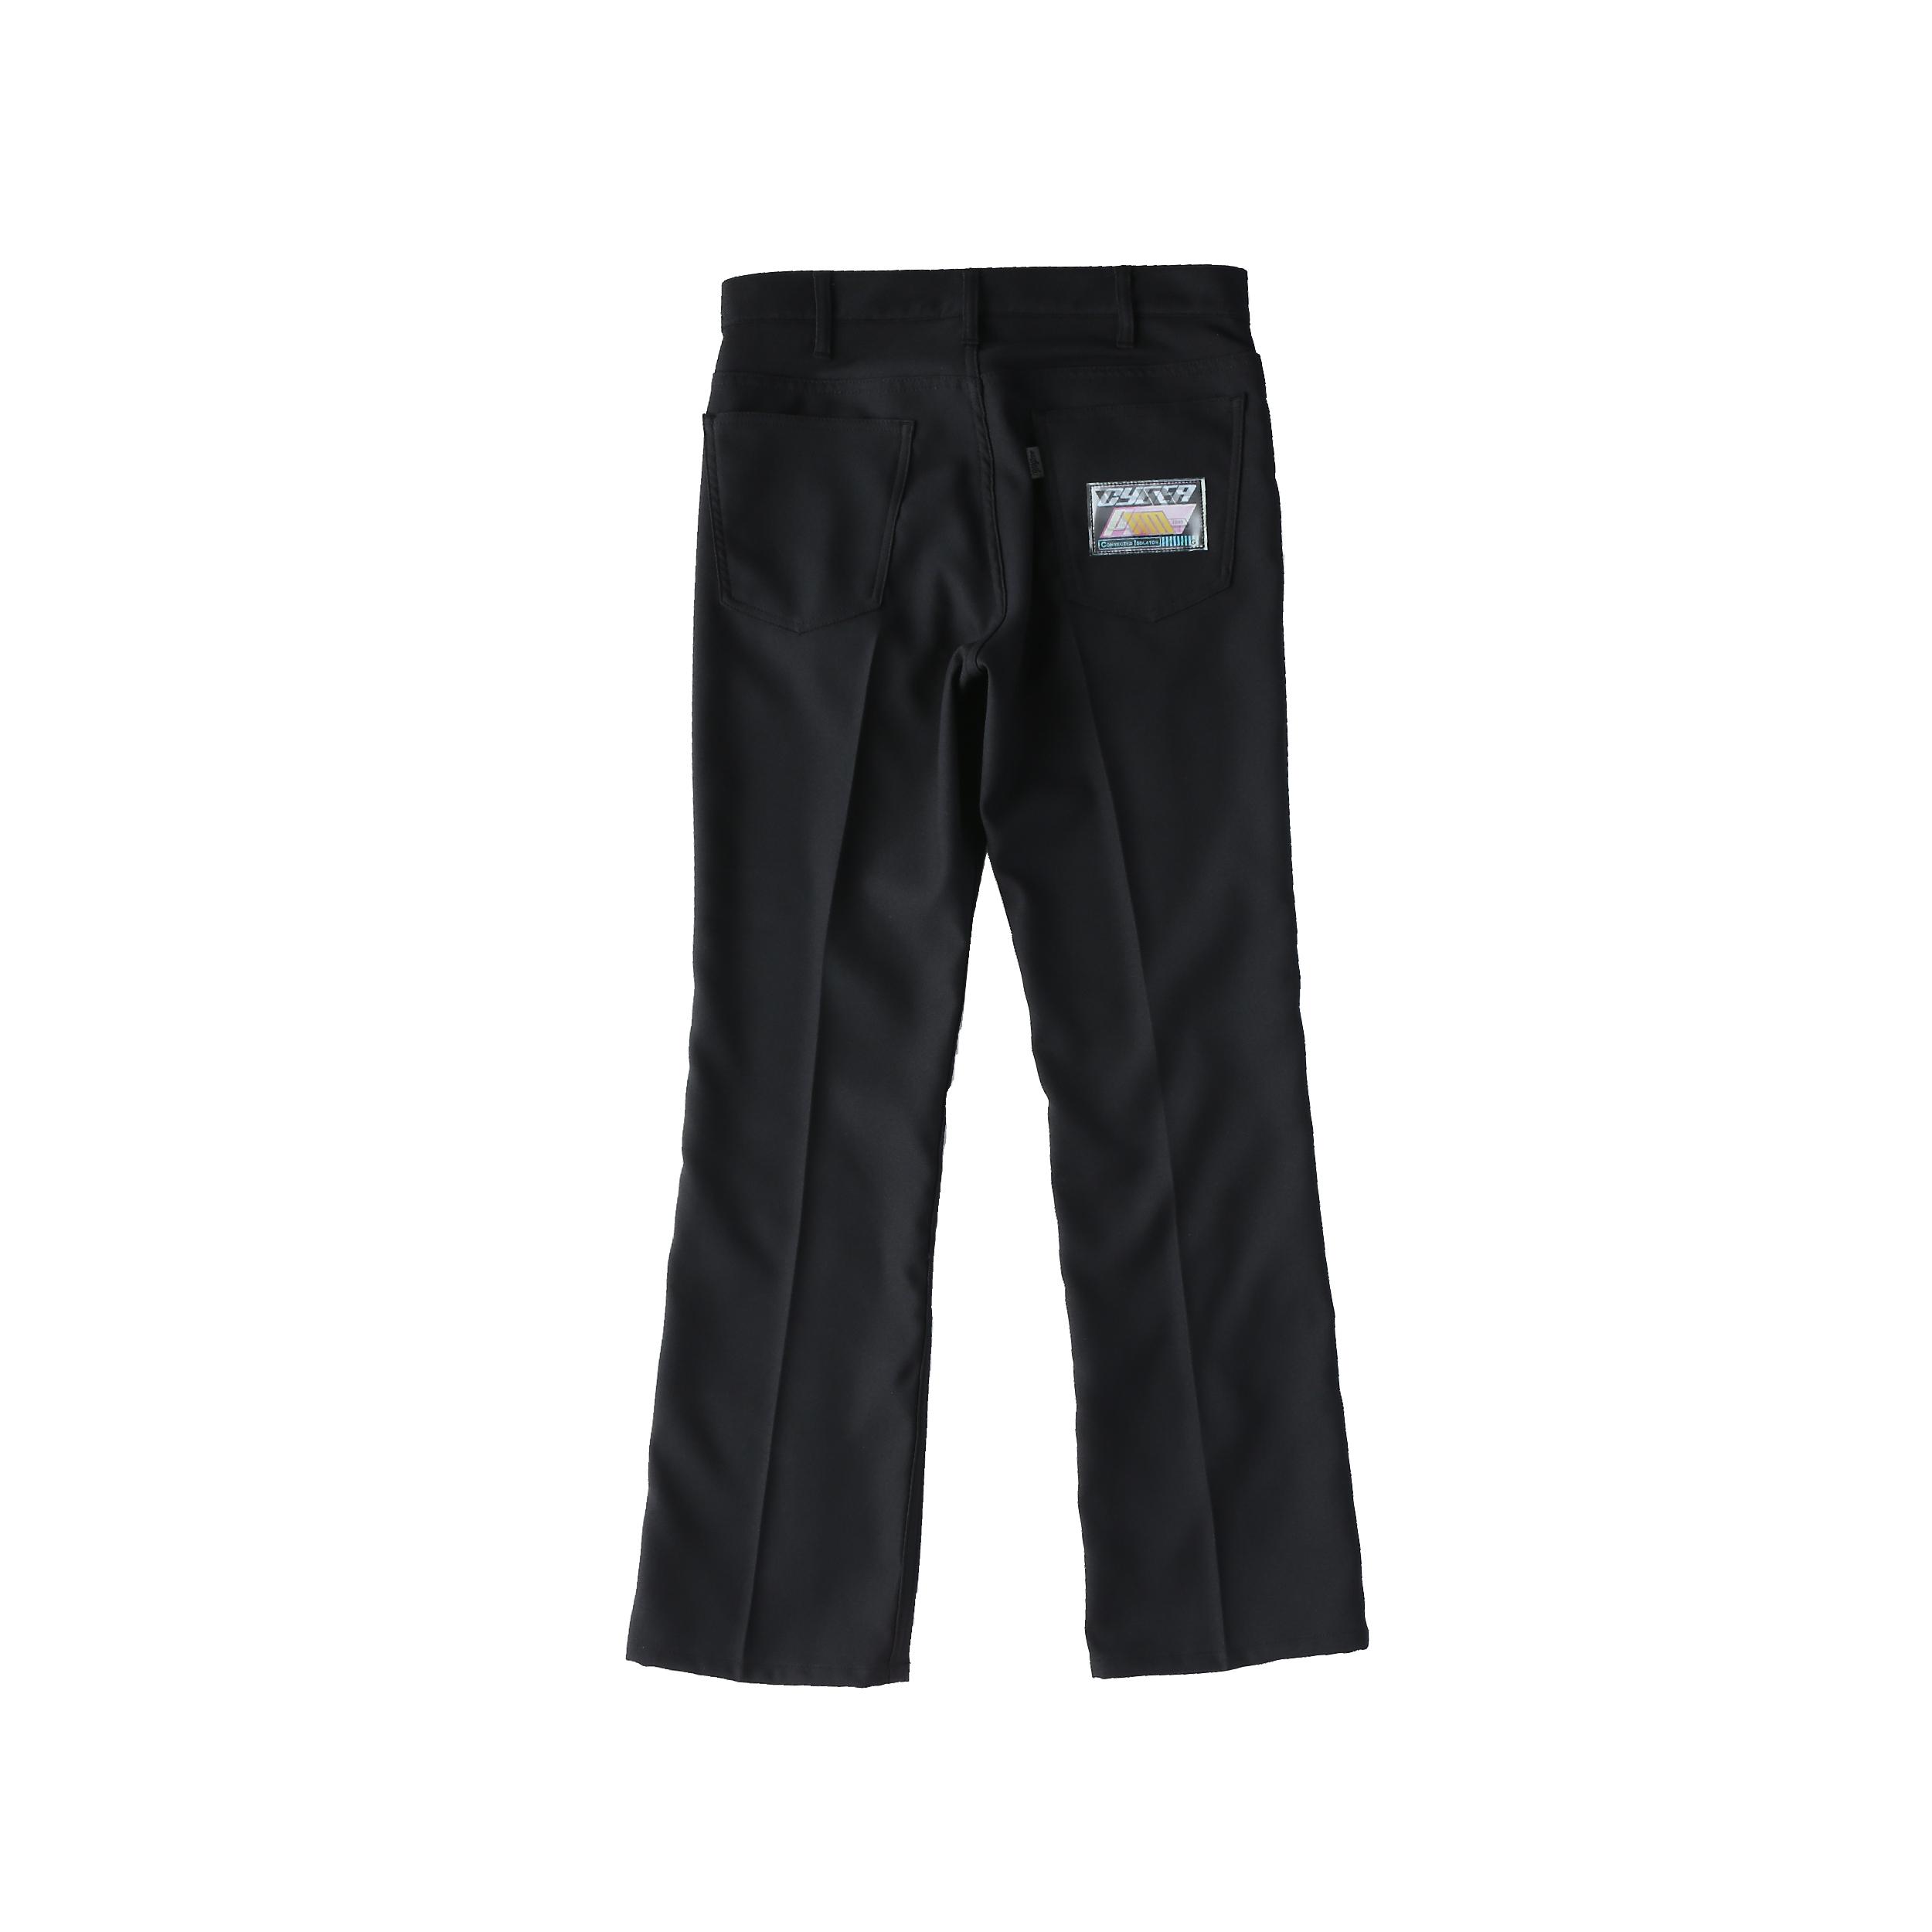 Wappen boot-cut pants / BLACK - 画像2